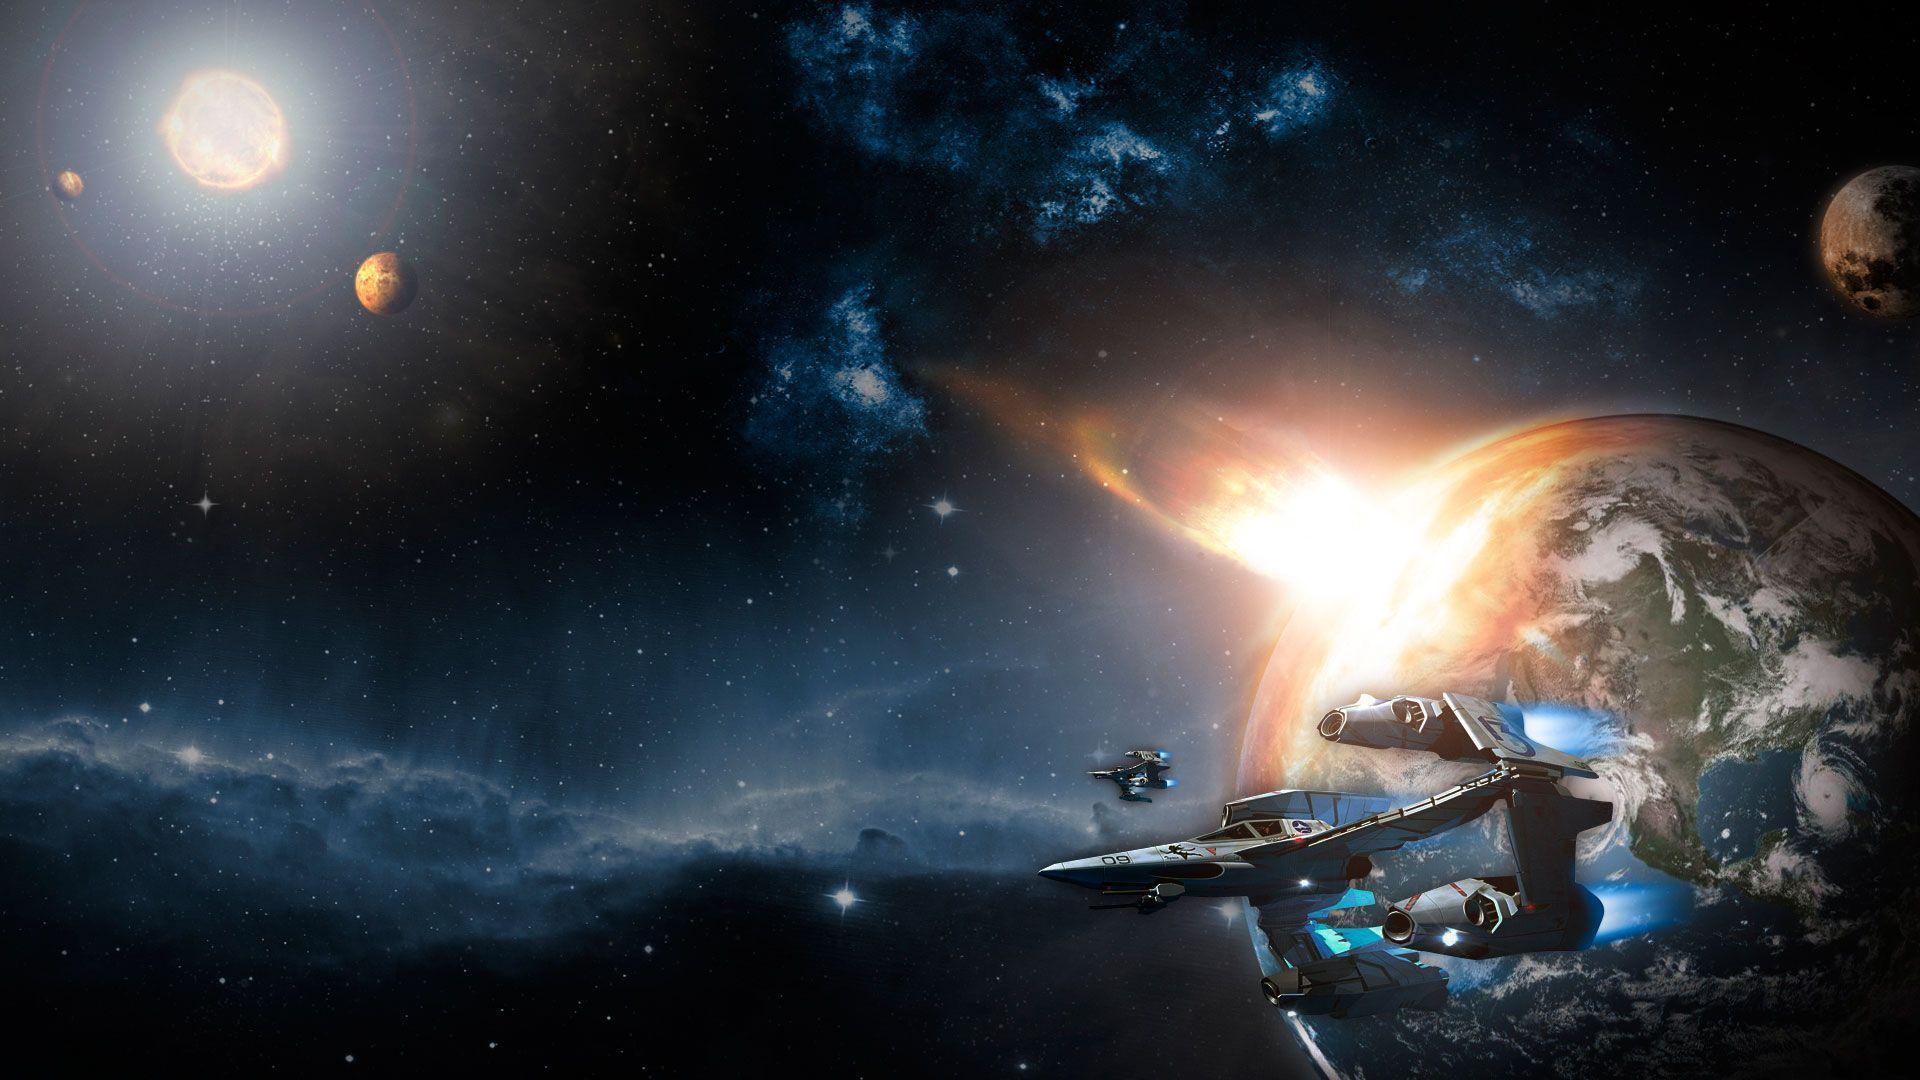 spaceship wallpaper image - warhammer dark force,science fiction ...